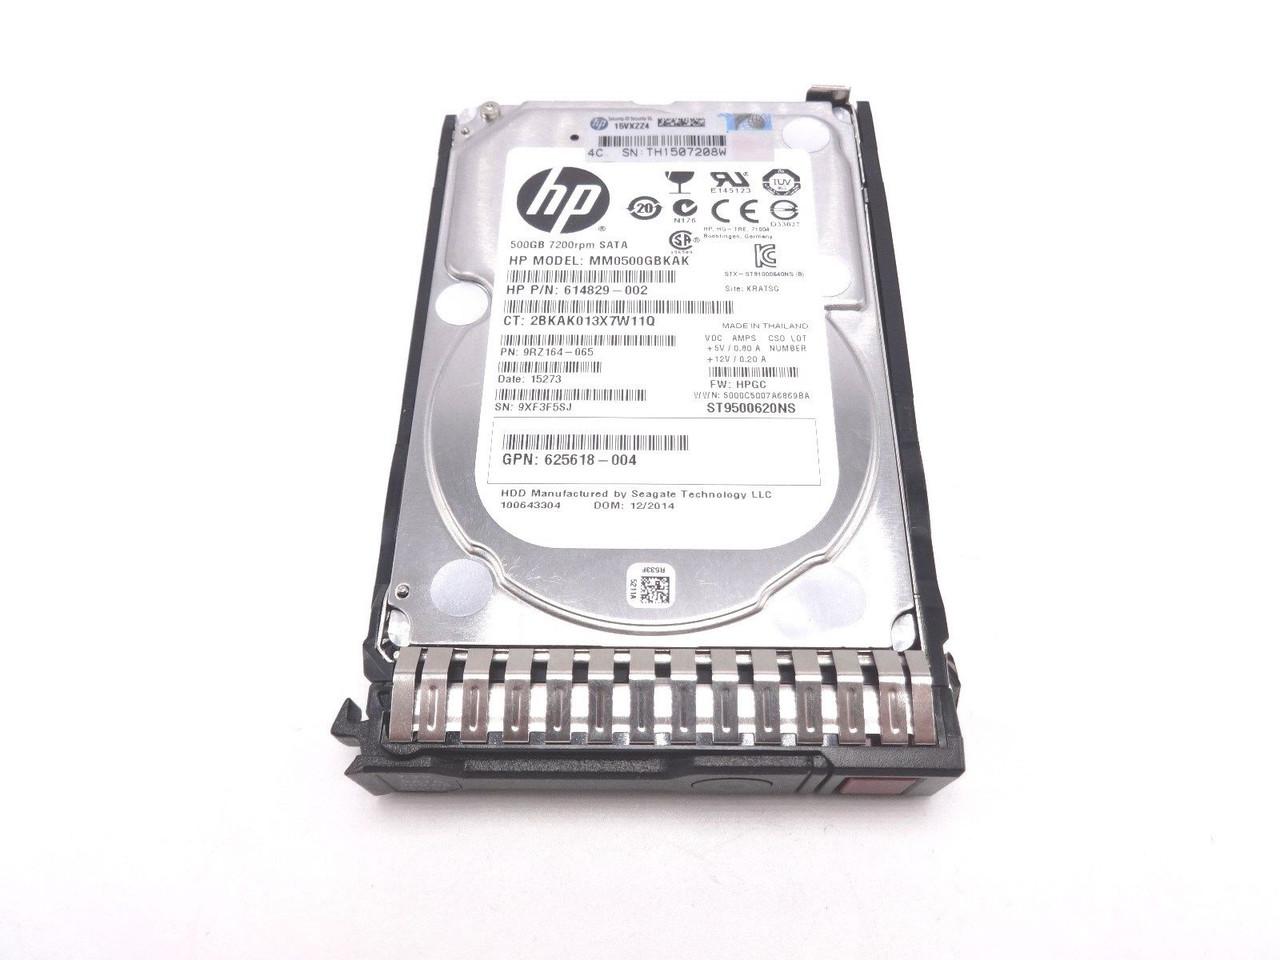 HP 656107-001 500GB 6G 7.2K 2.5IN SATA MDL hard drive